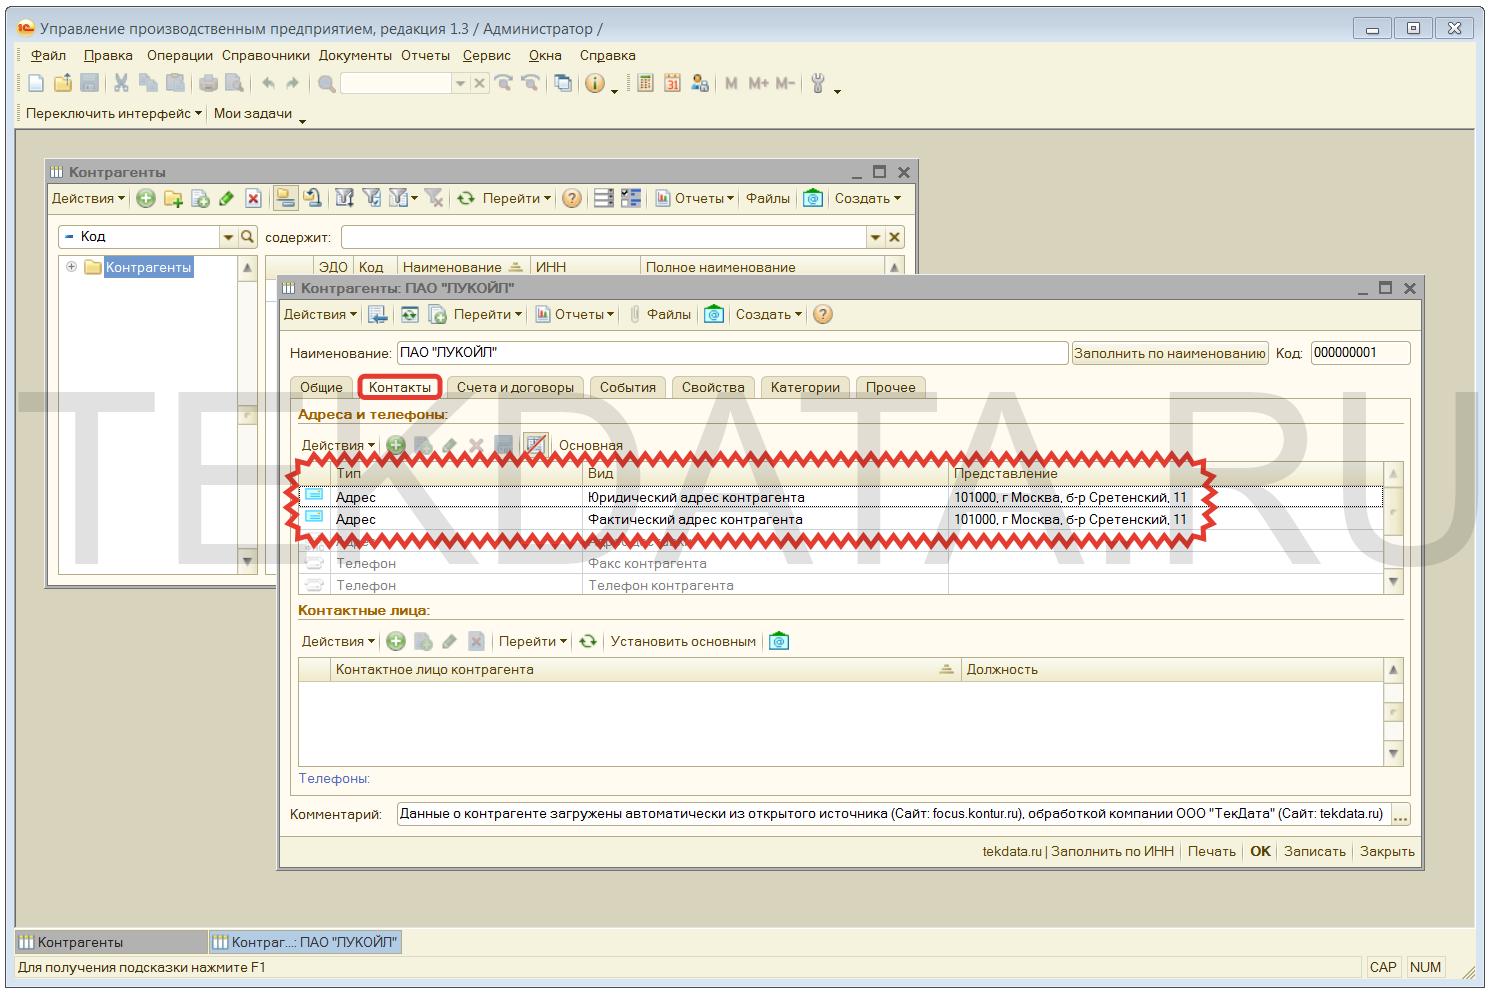 Заполнение контрагентов по ИНН в УПП 1.3 (Результат 2) | tekdata.ru